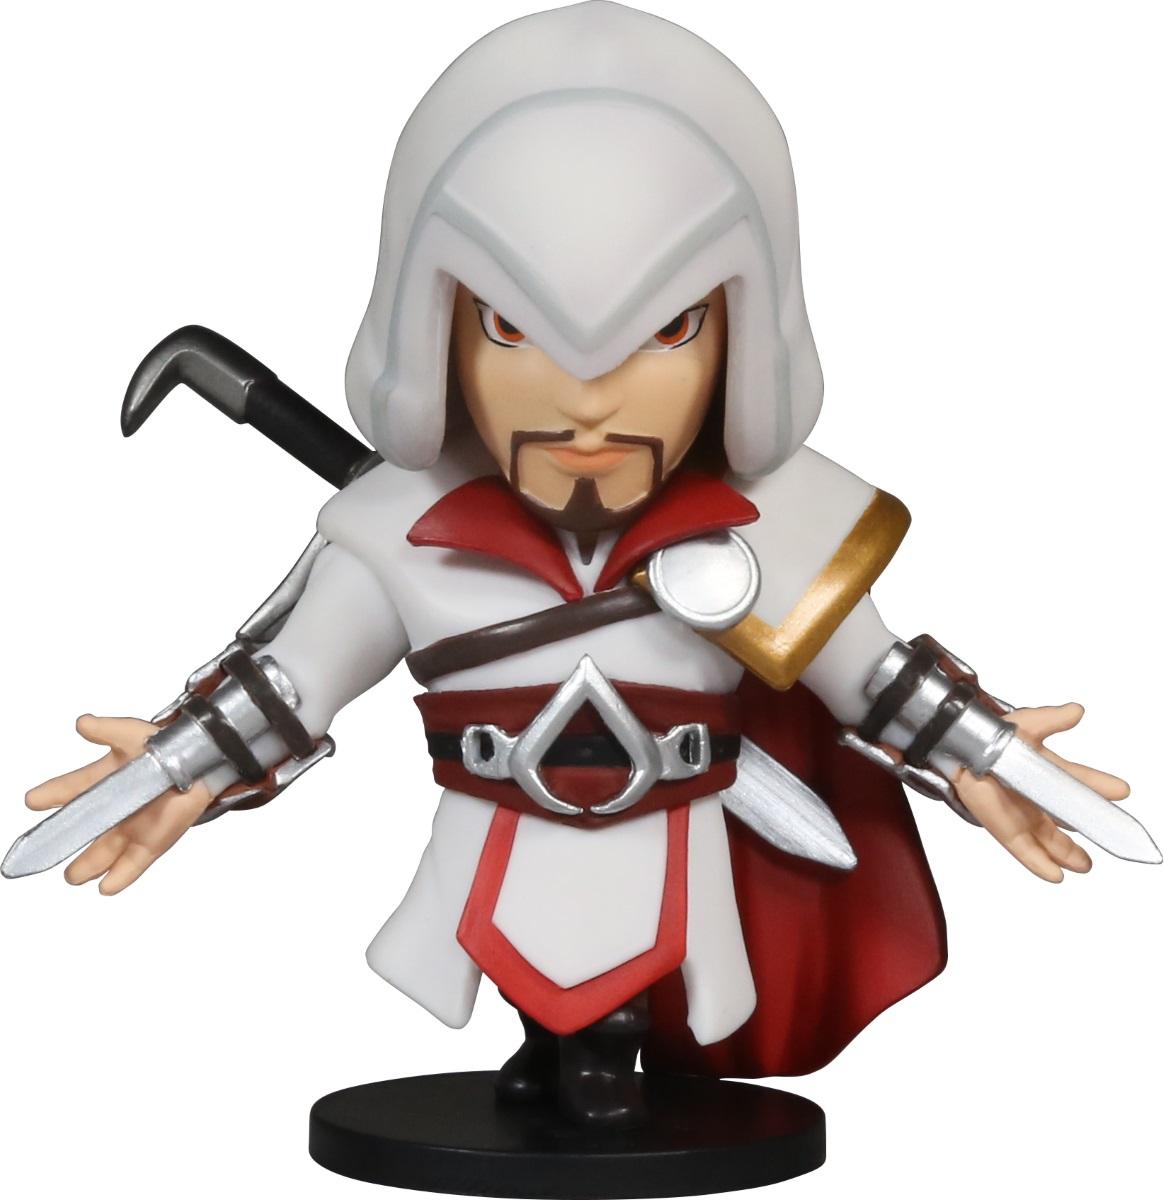 все цены на Коллекционная фигурка Assassin's Creed Soul Hunters: Ezio Brotherhood (8 см) онлайн